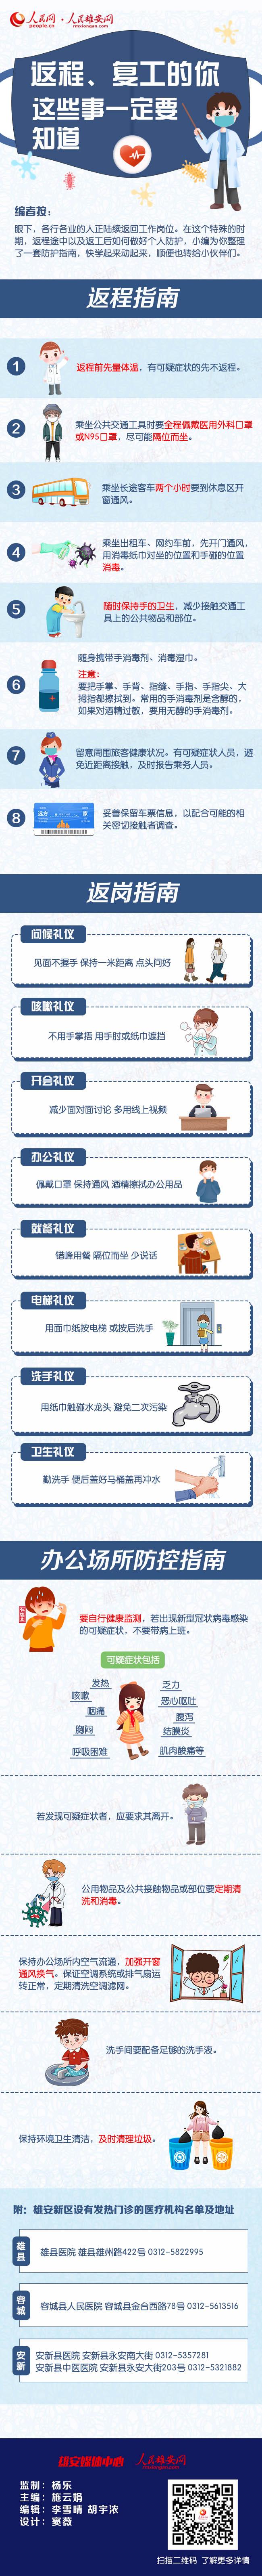 返程�凸ぁ⑸�(shang)�W需要(yao)注意(yi)什�N(me)?�@些事情你要(yao)知道